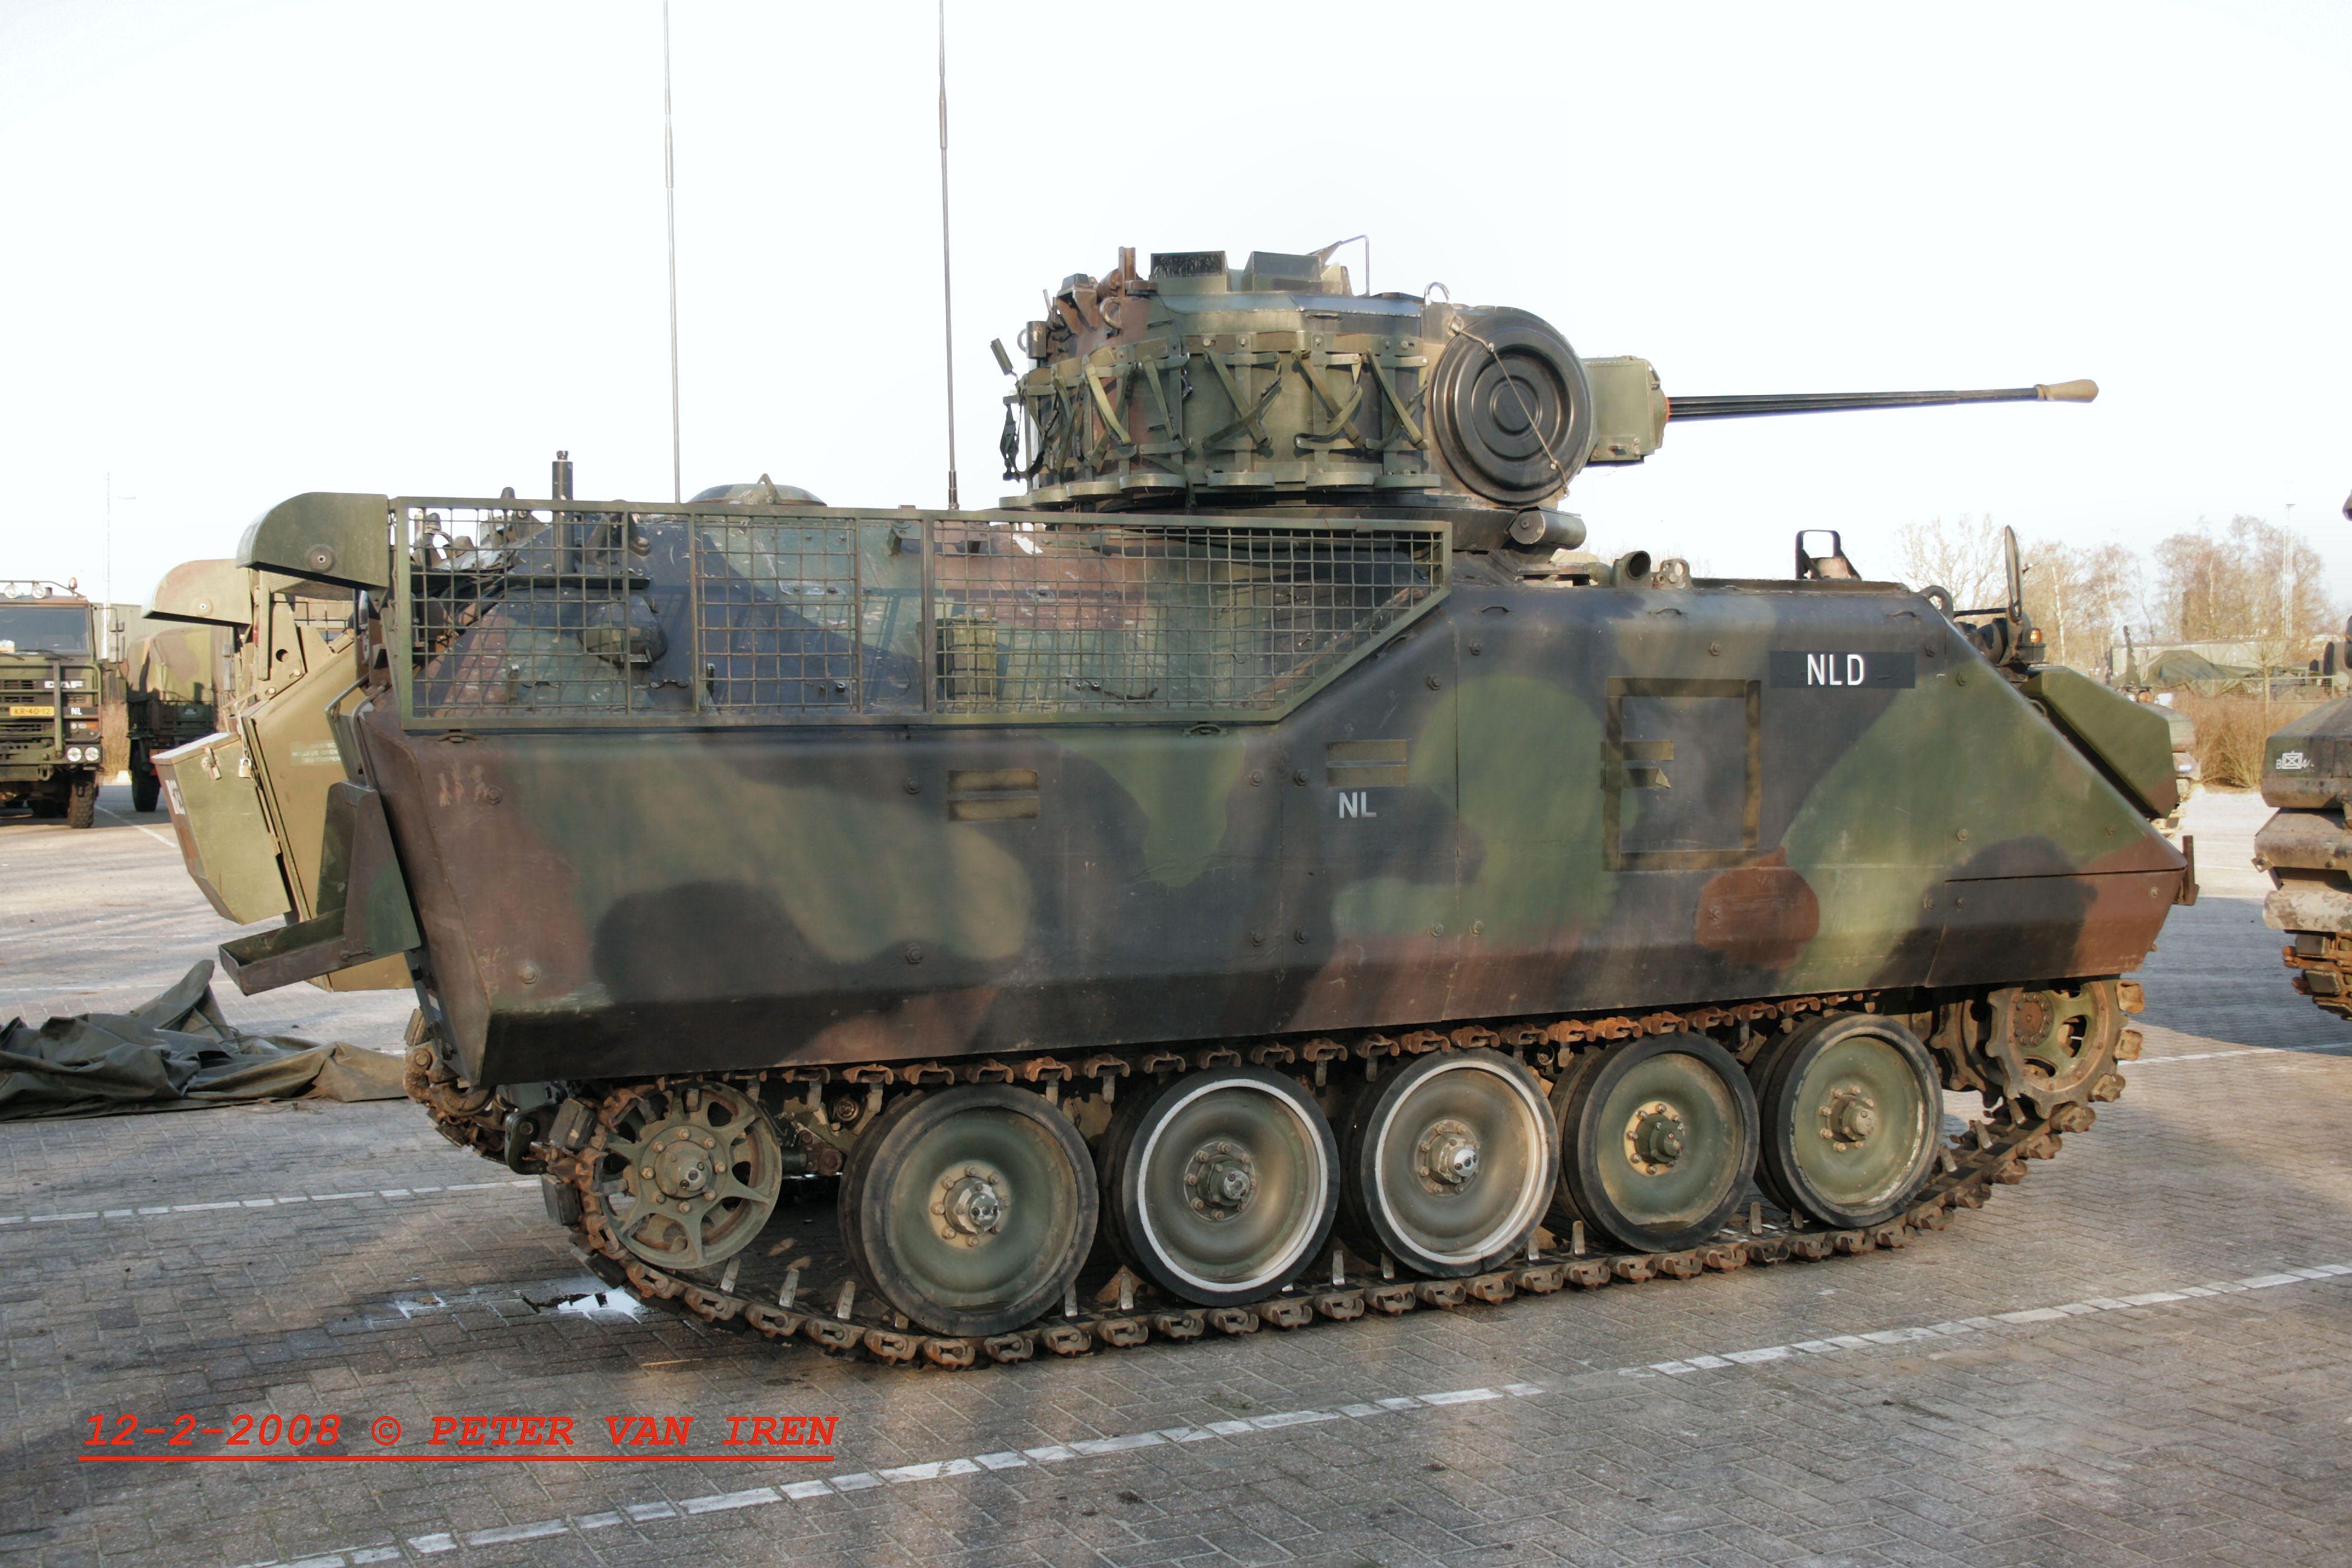 e4acf9f18d46 YPR 765 PRI Armored Fighting Vehicle